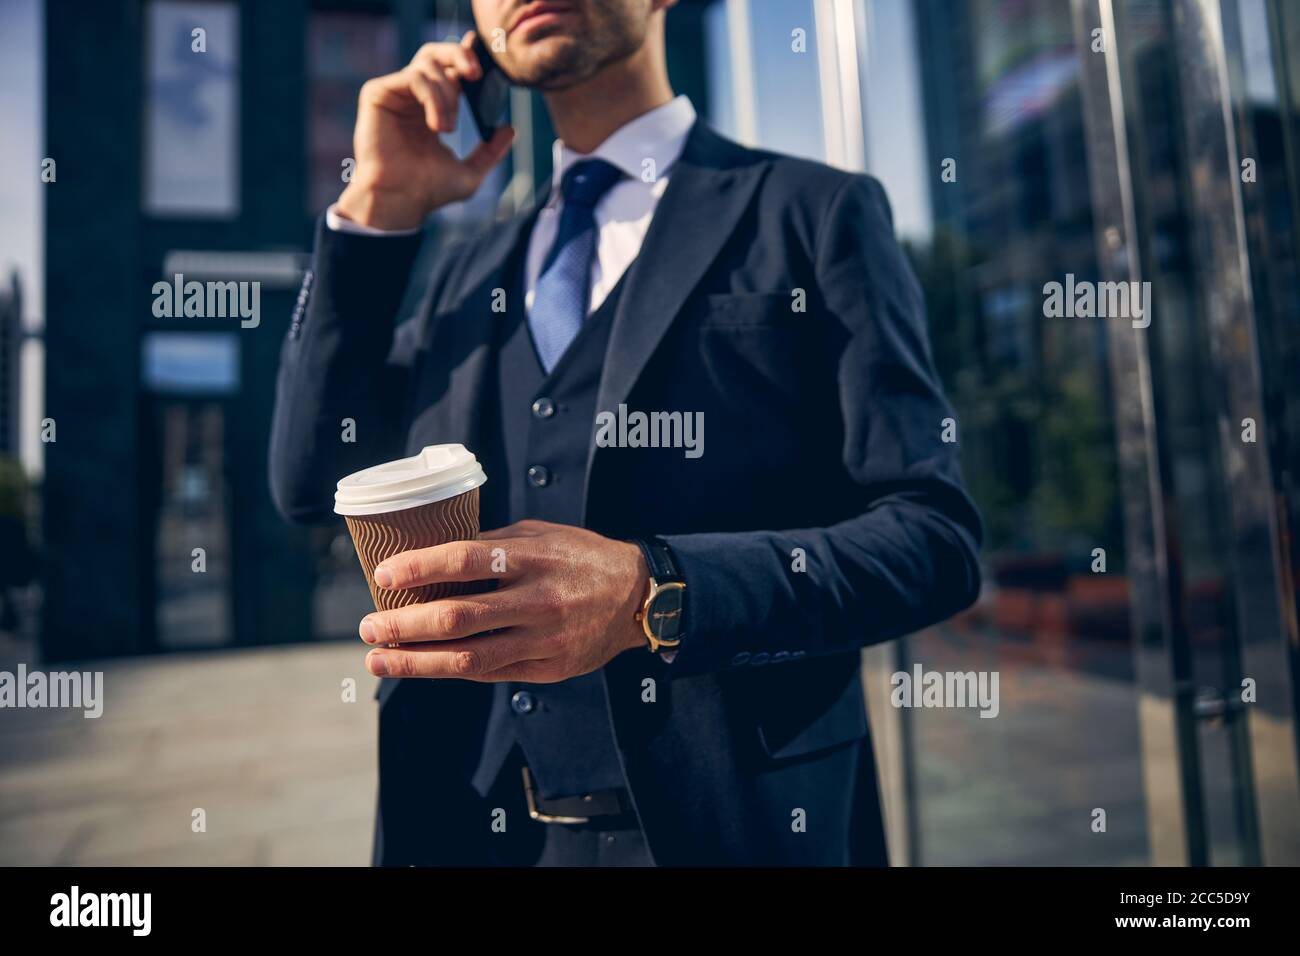 Junger Mann, der vor dem Büro telefoniert Stockfoto